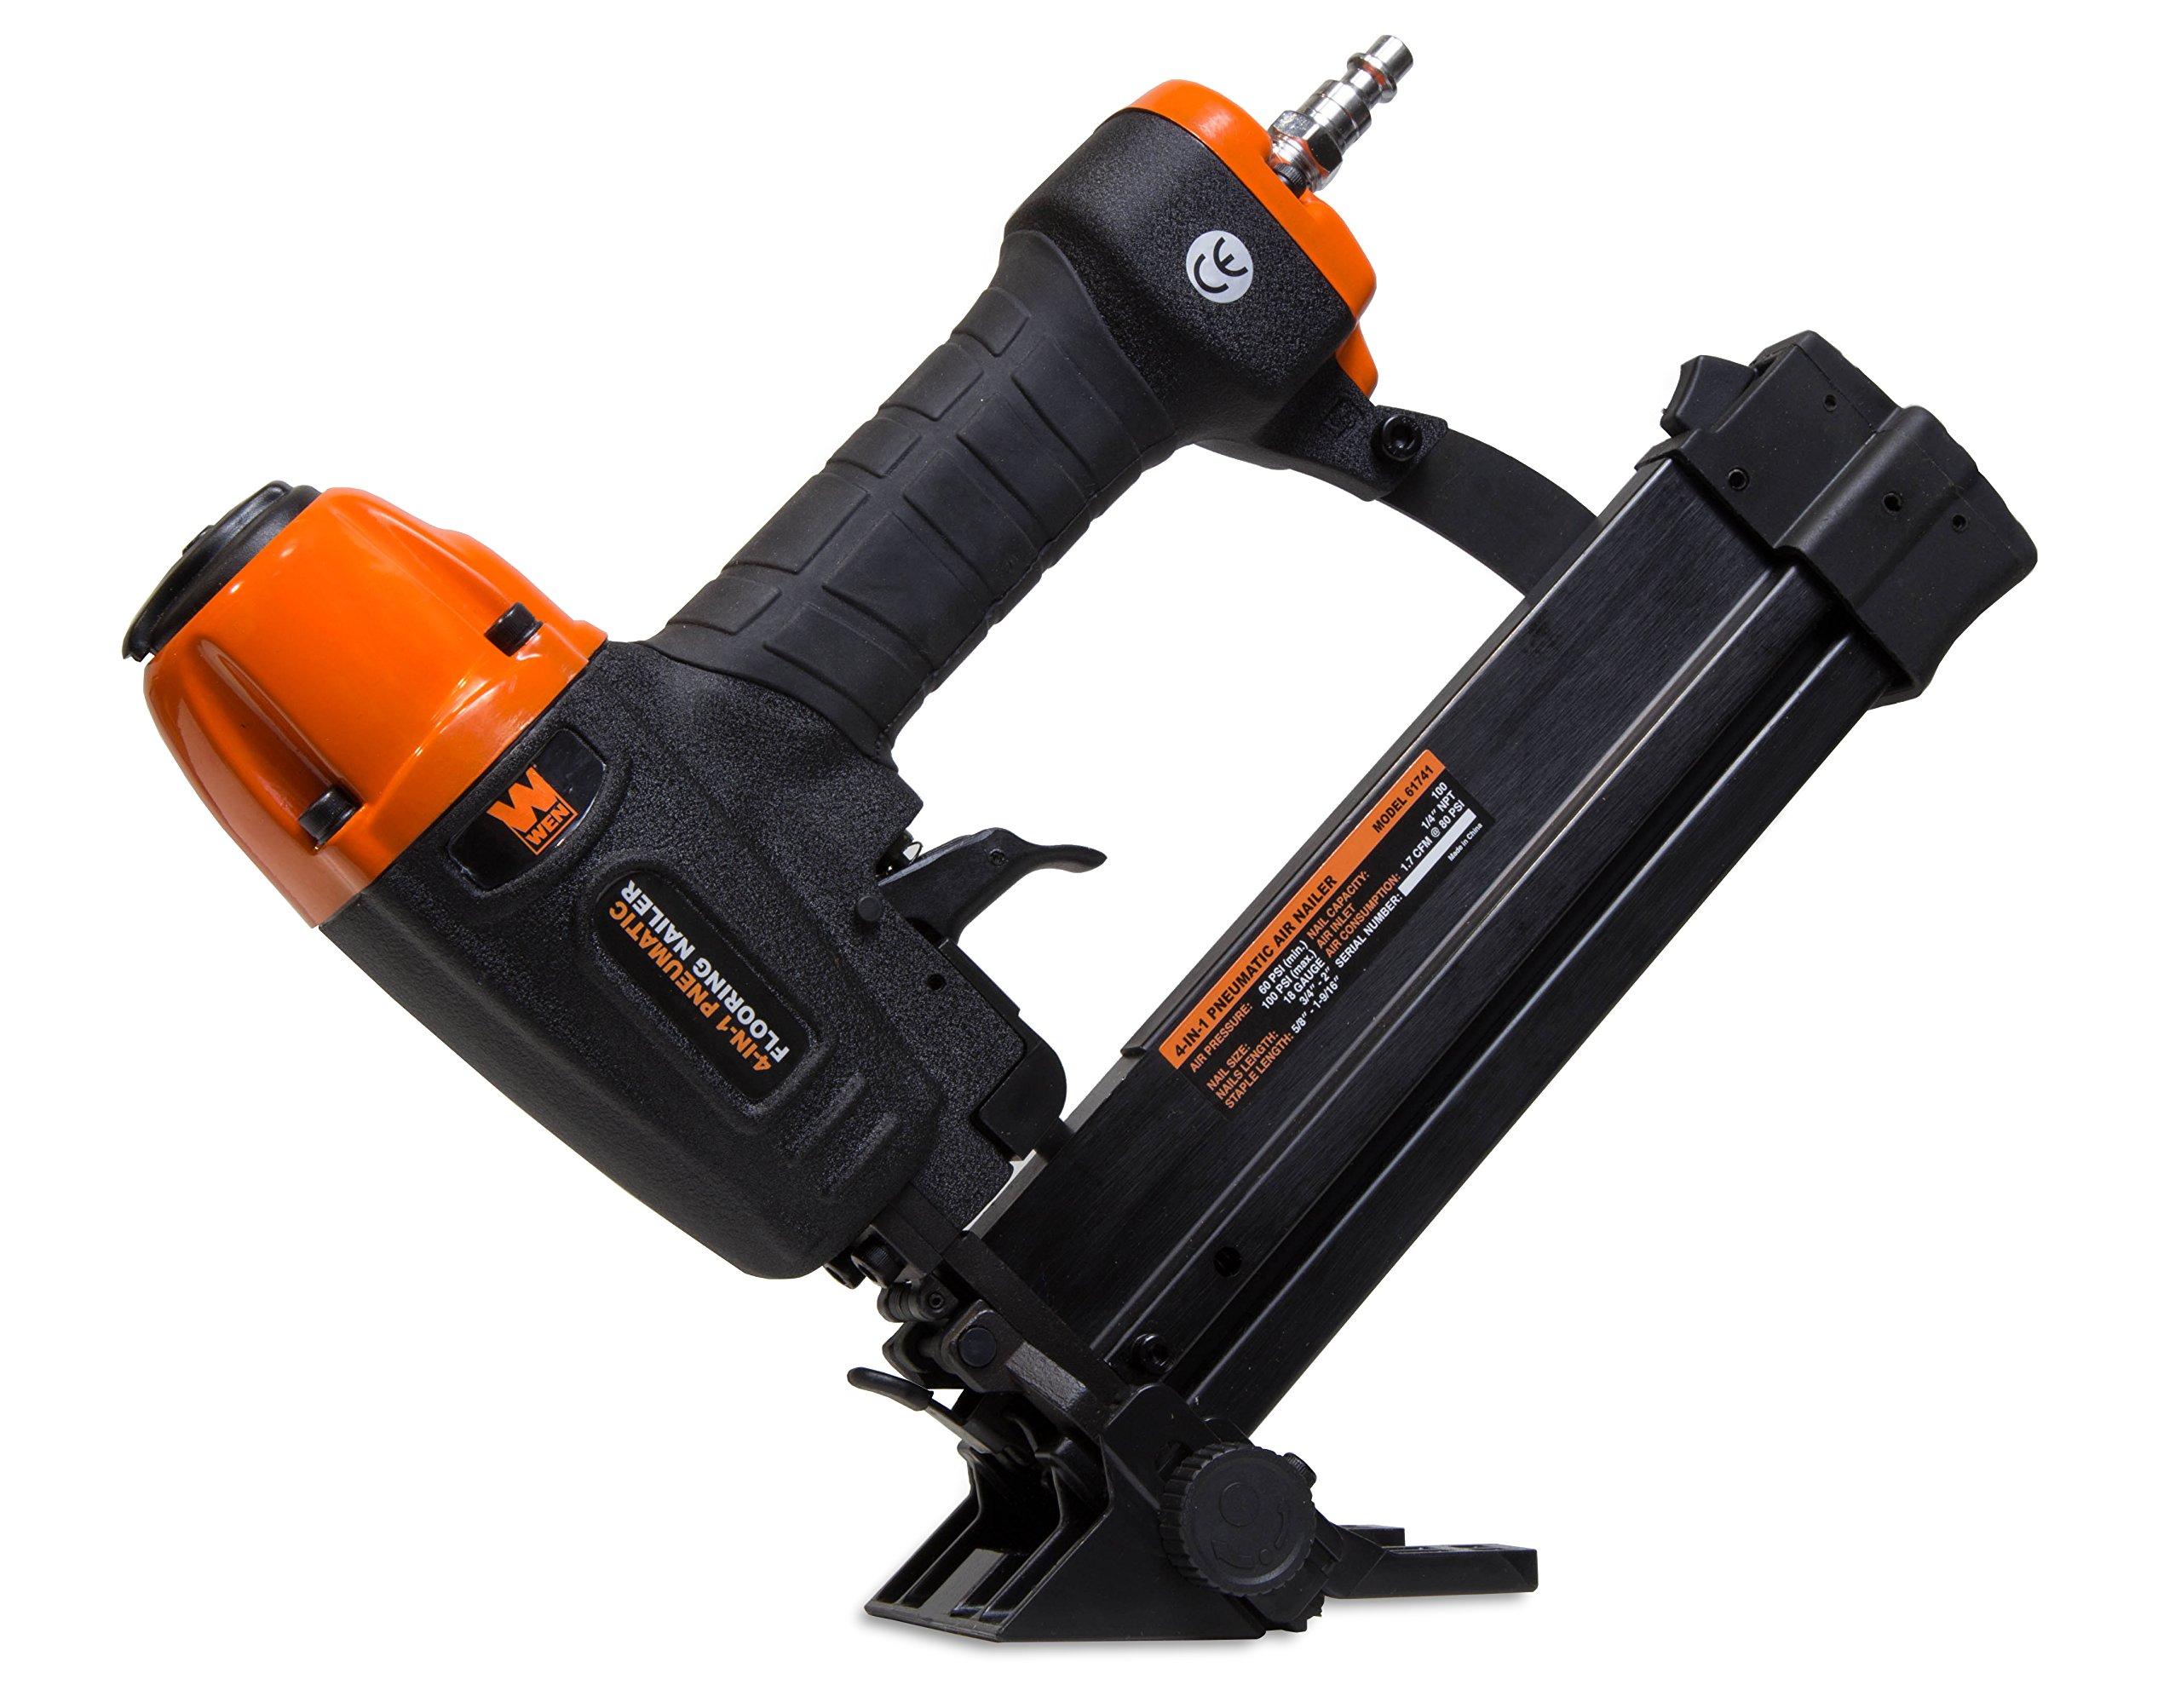 WEN 61741 4-in-1 18-Gauge Pneumatic Flooring Nailer and Stapler with Case by WEN